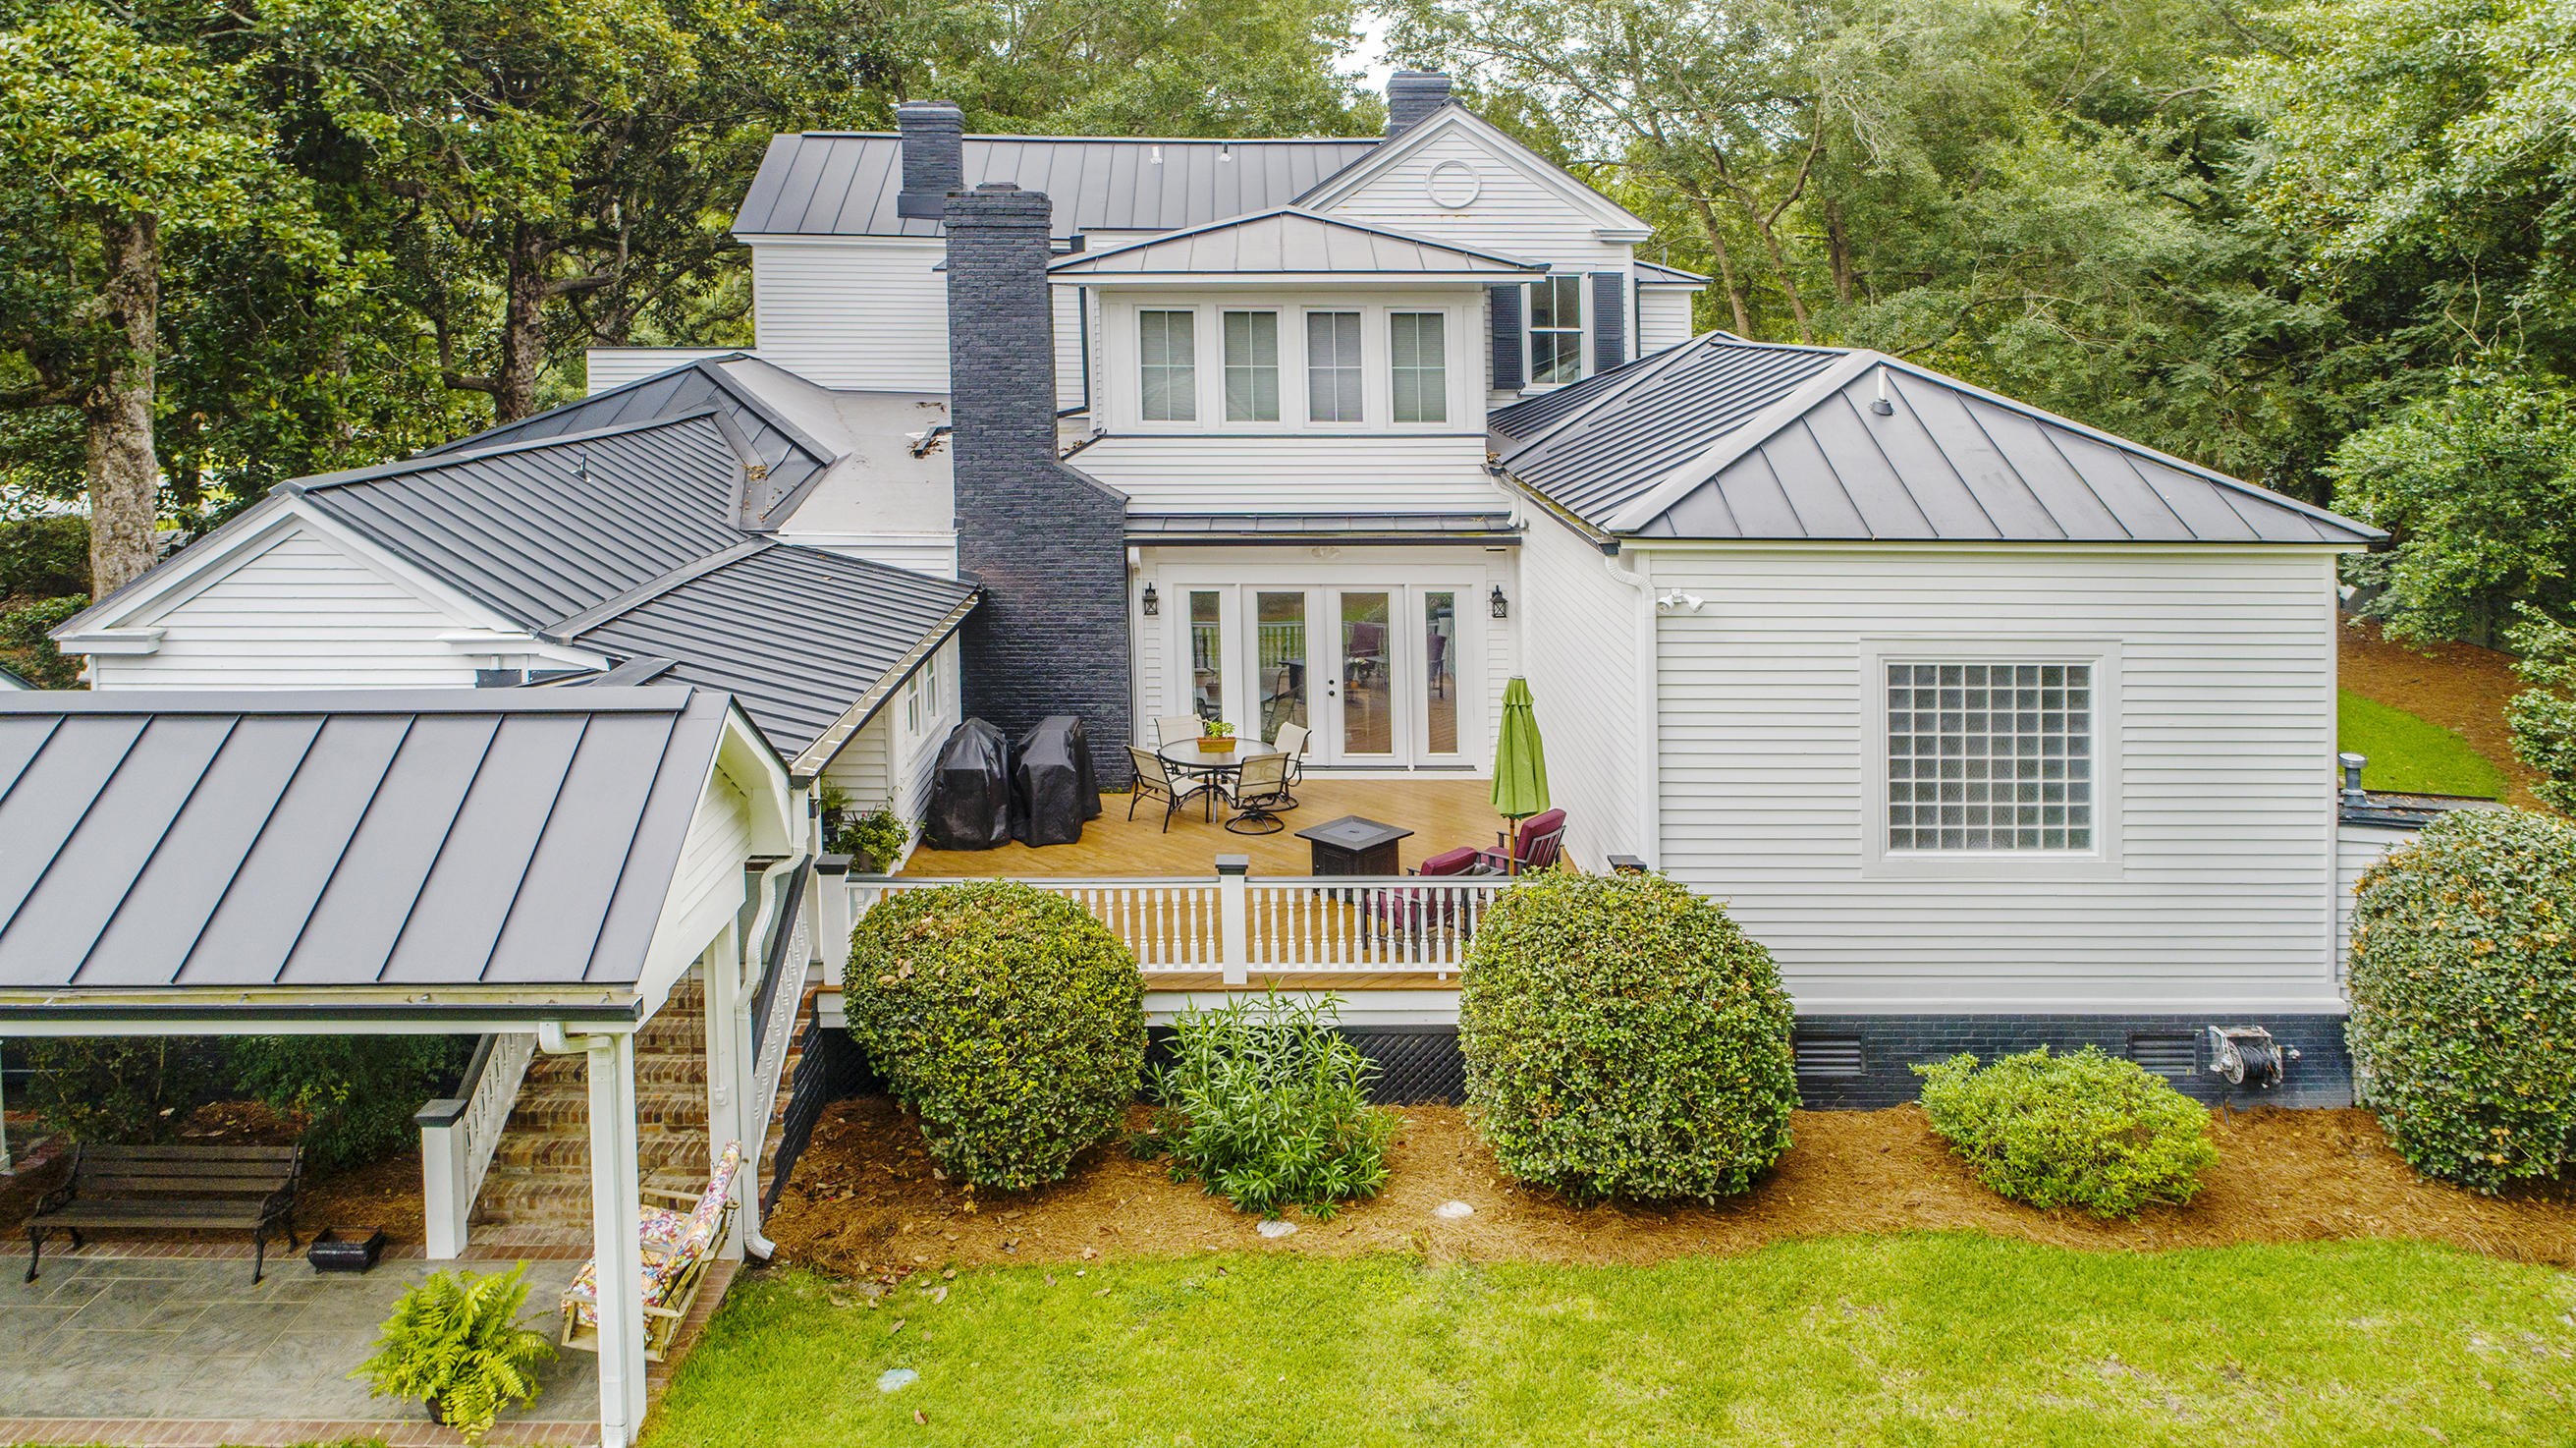 Summerville Homes For Sale - 102 Hickory, Summerville, SC - 69